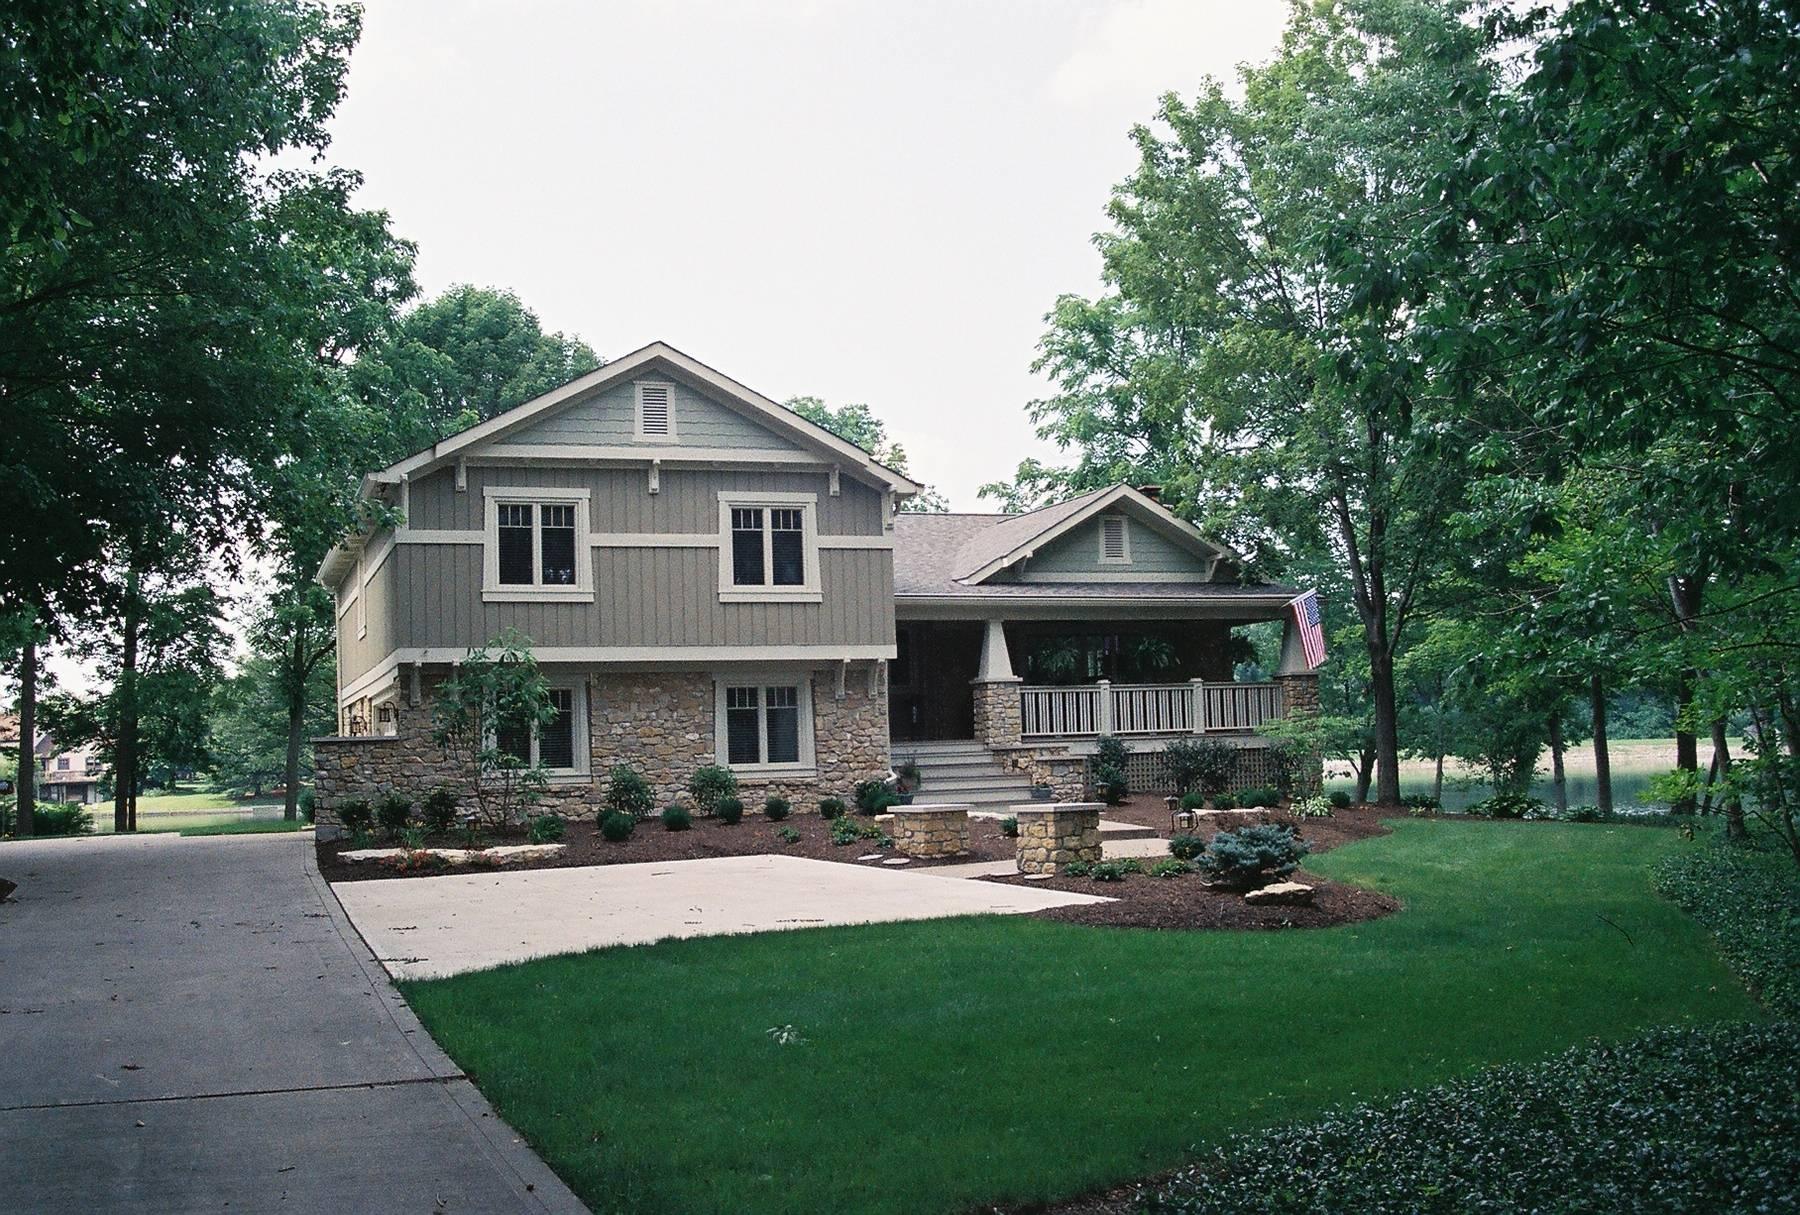 Home Additions Remodeling Split Level Addition Remodel   House Plans   58412